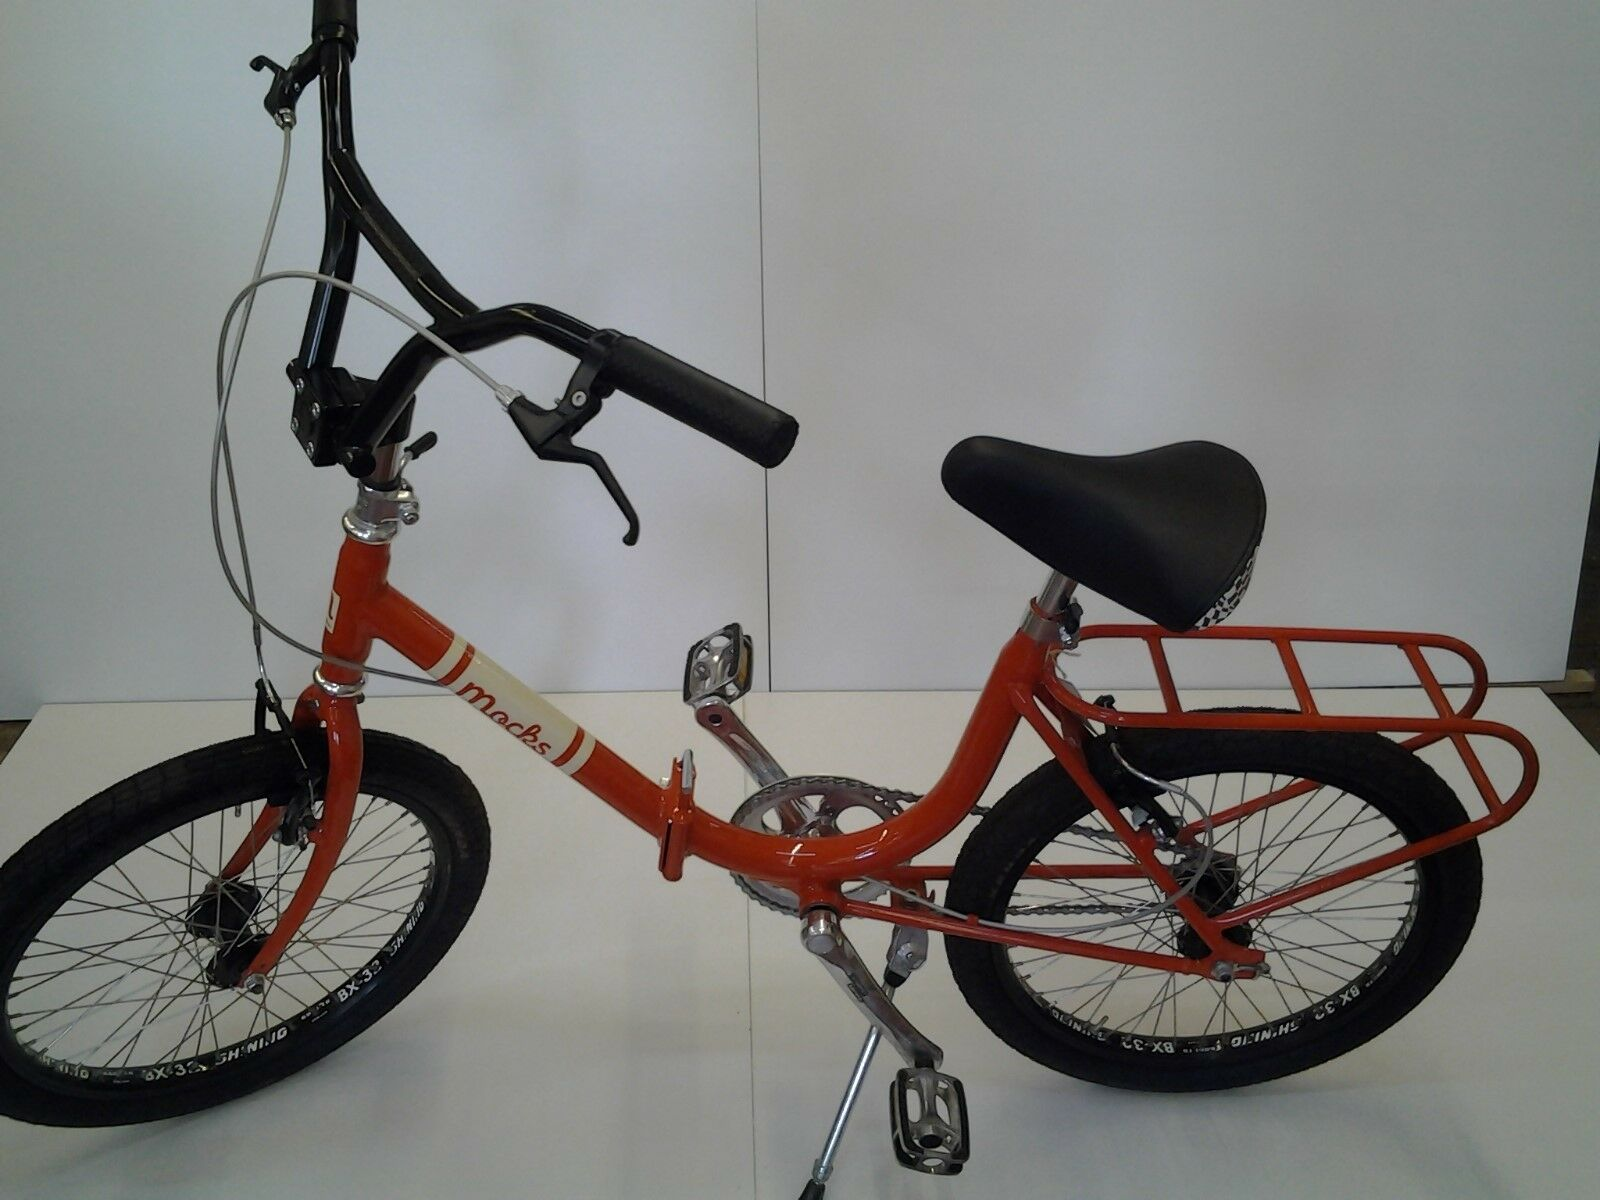 'Mocks' Vintage Scappatella by Abici Folding Bicycle (Italian) Orange RRP £800